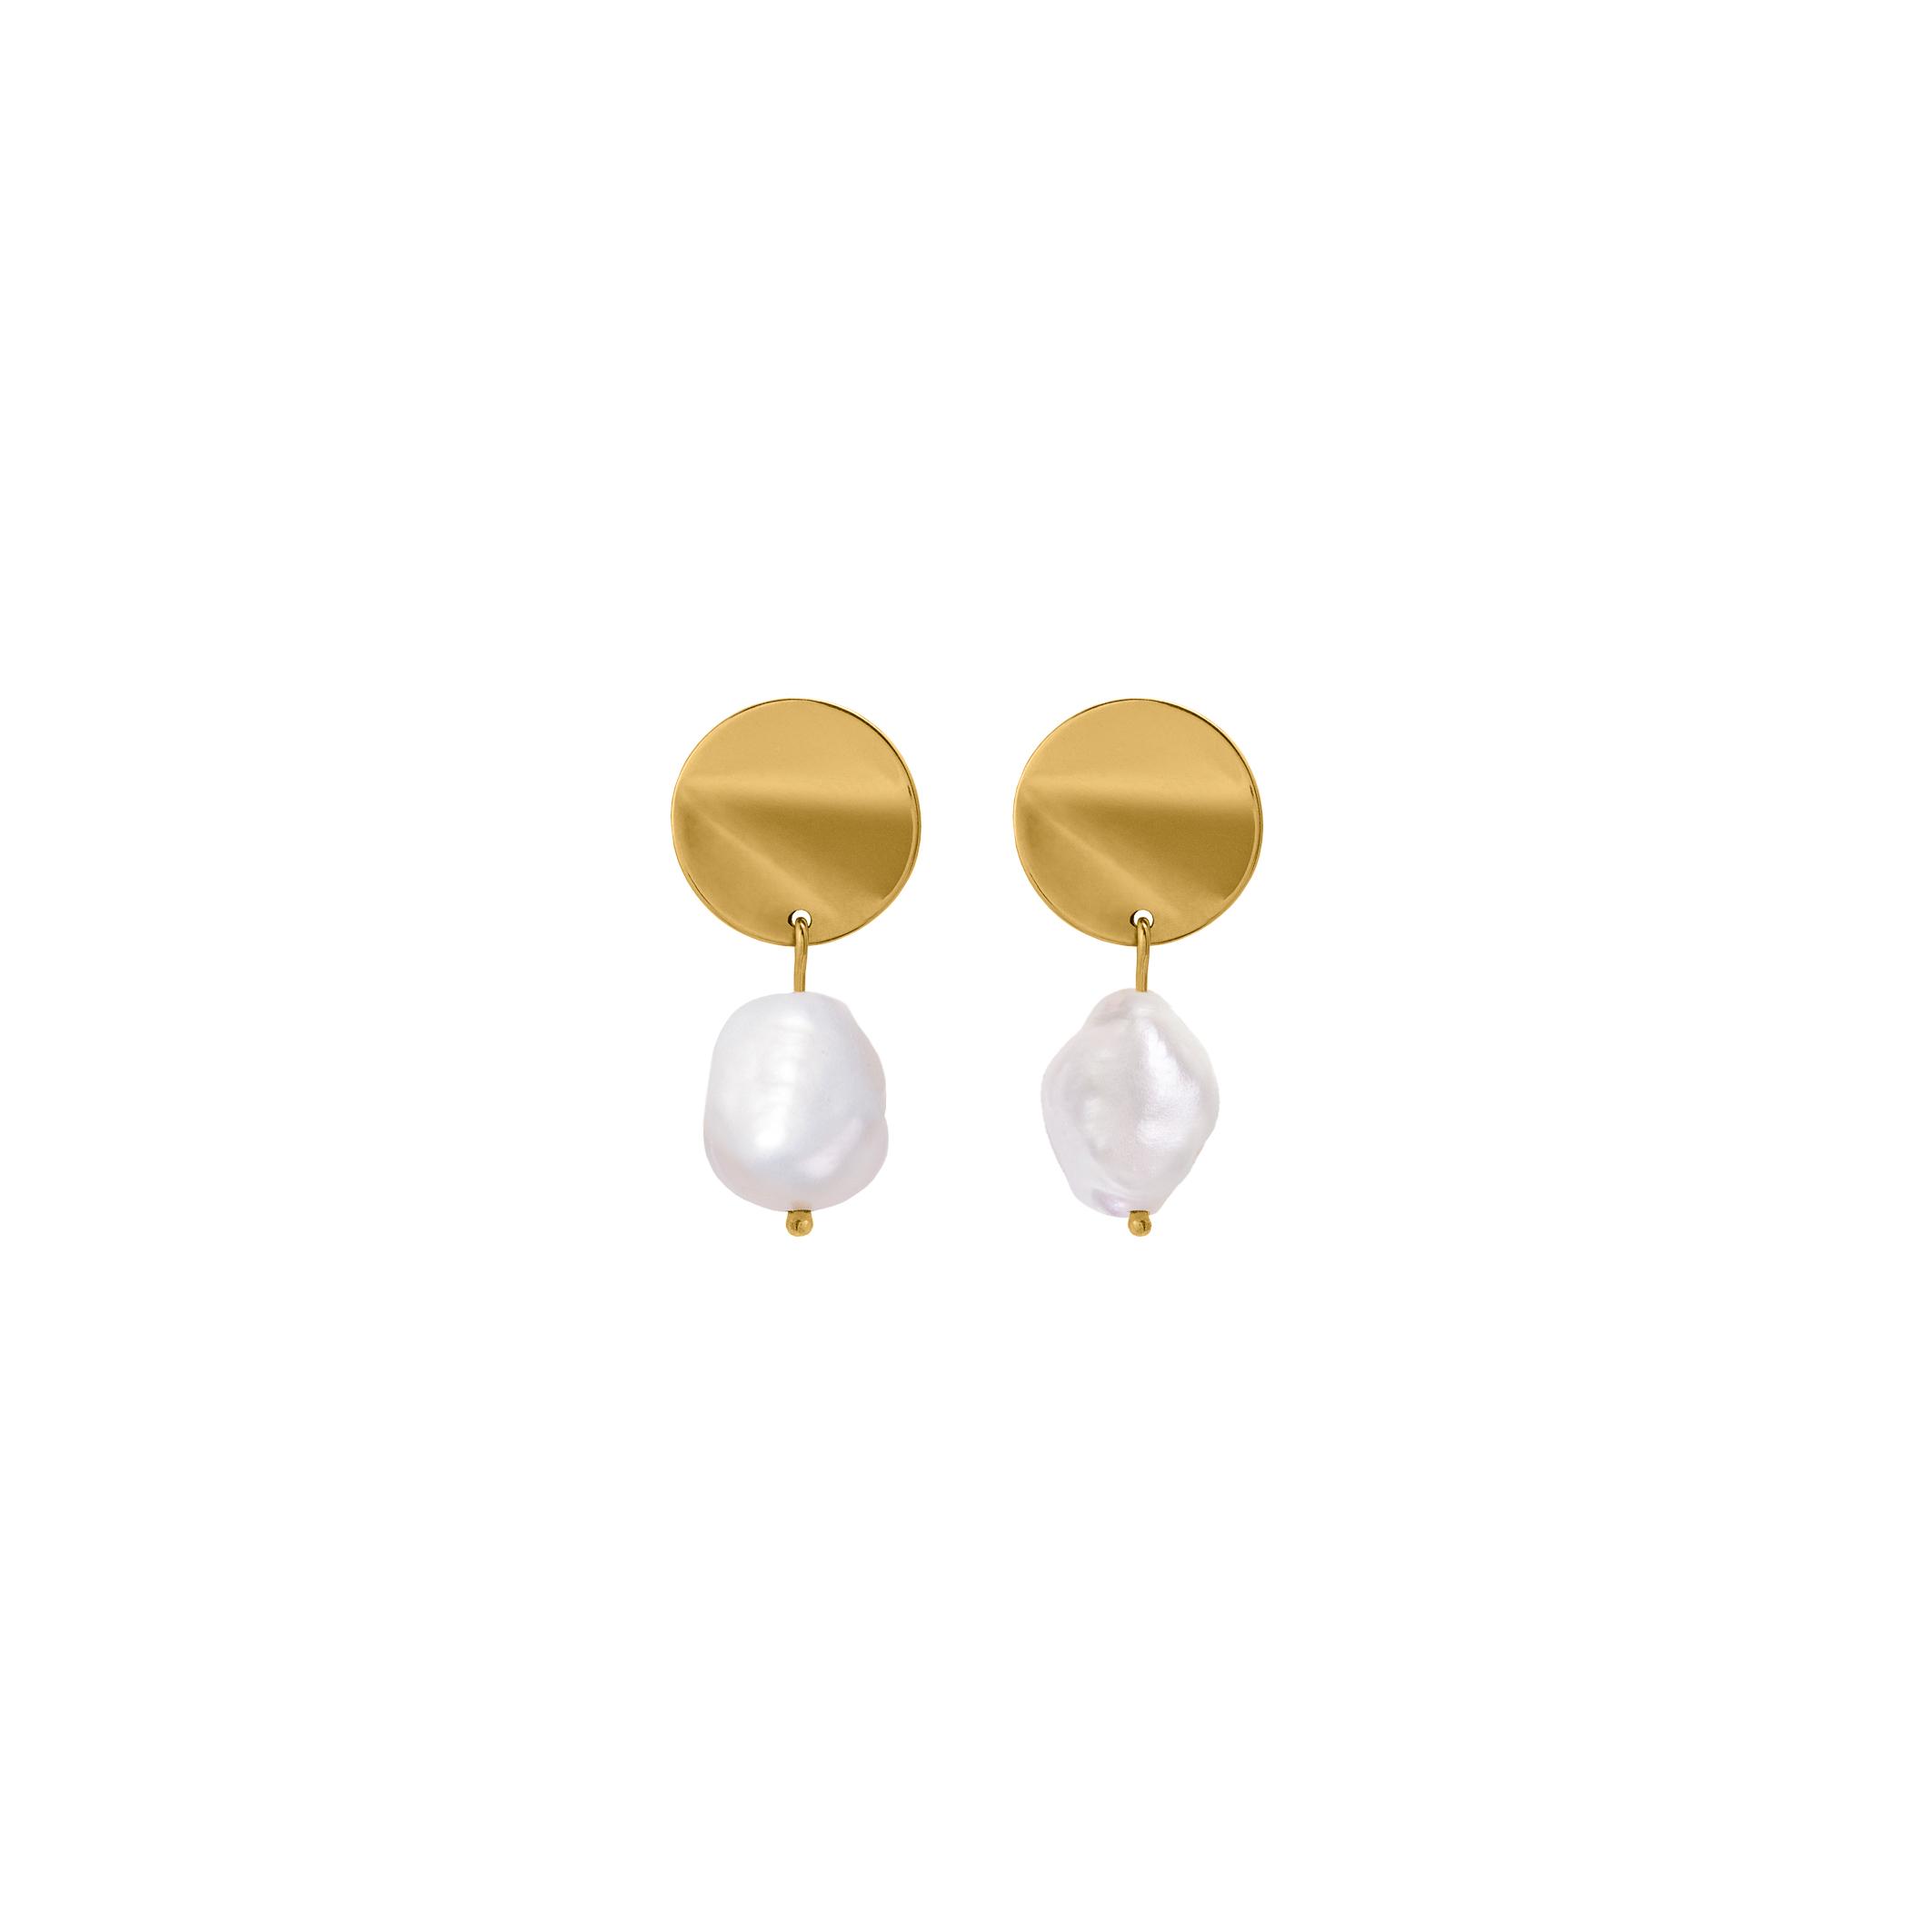 CLASSIC PEARL EARRINGS